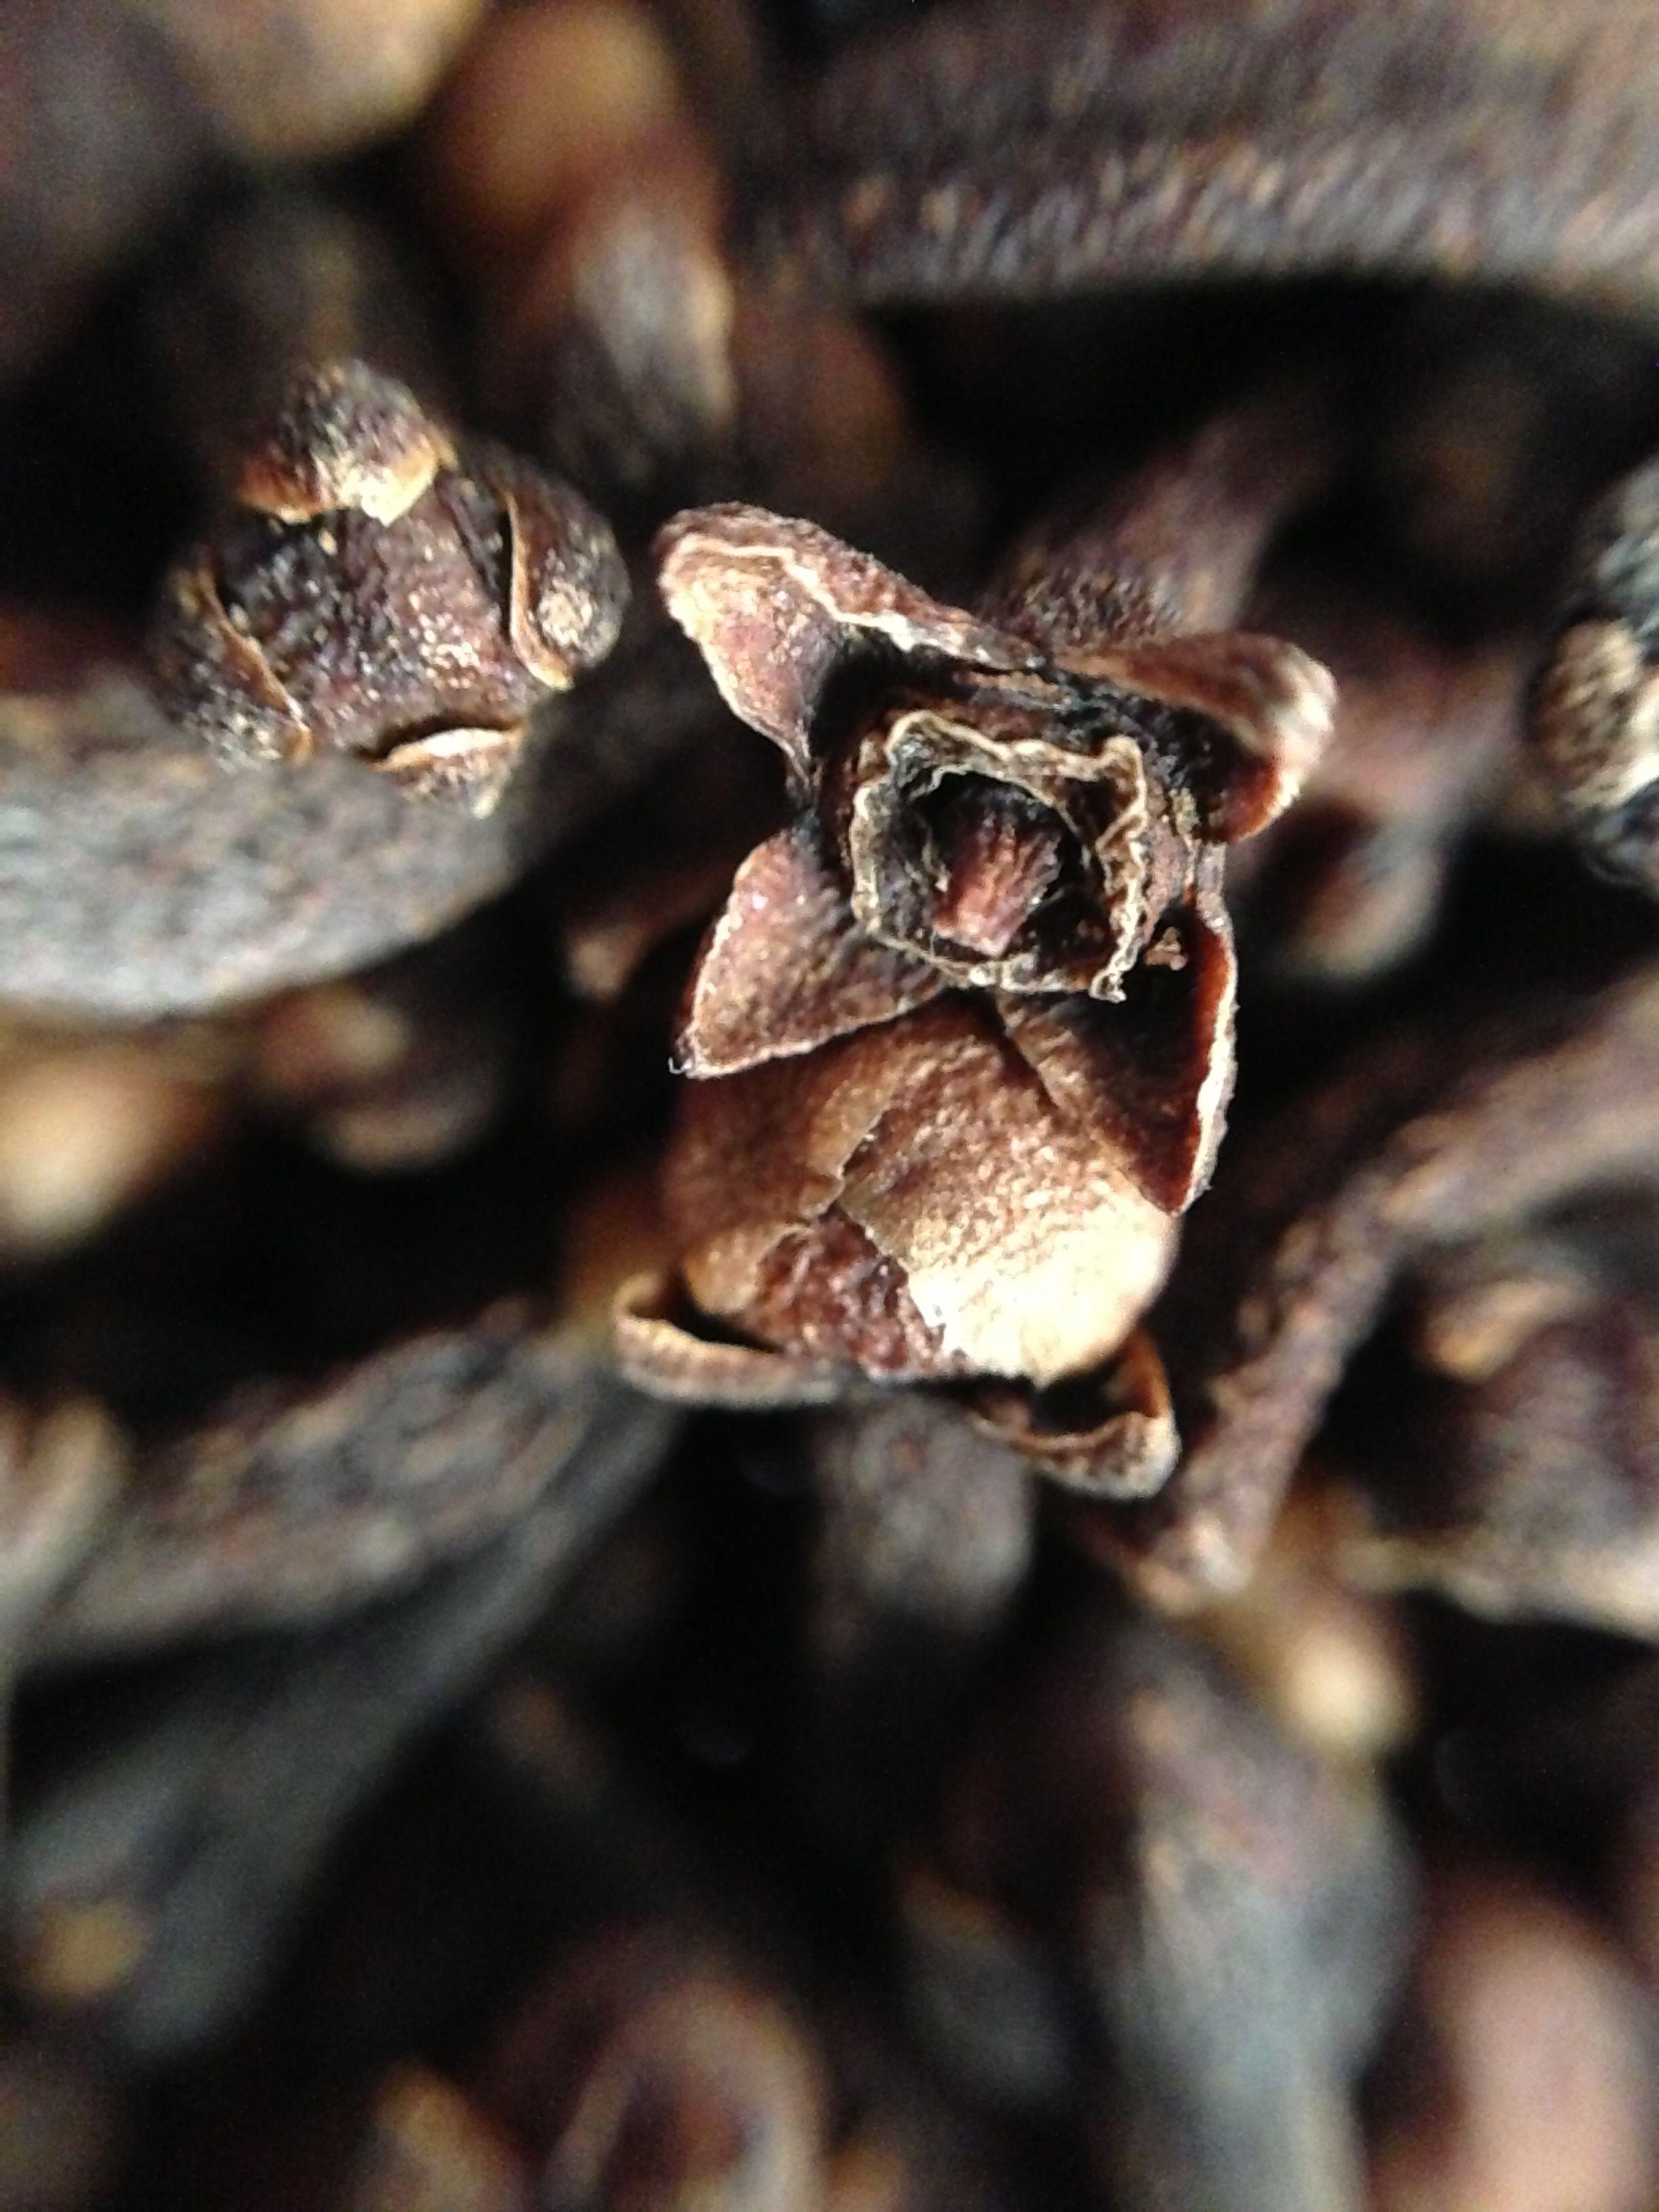 syzygium aromaticum buds